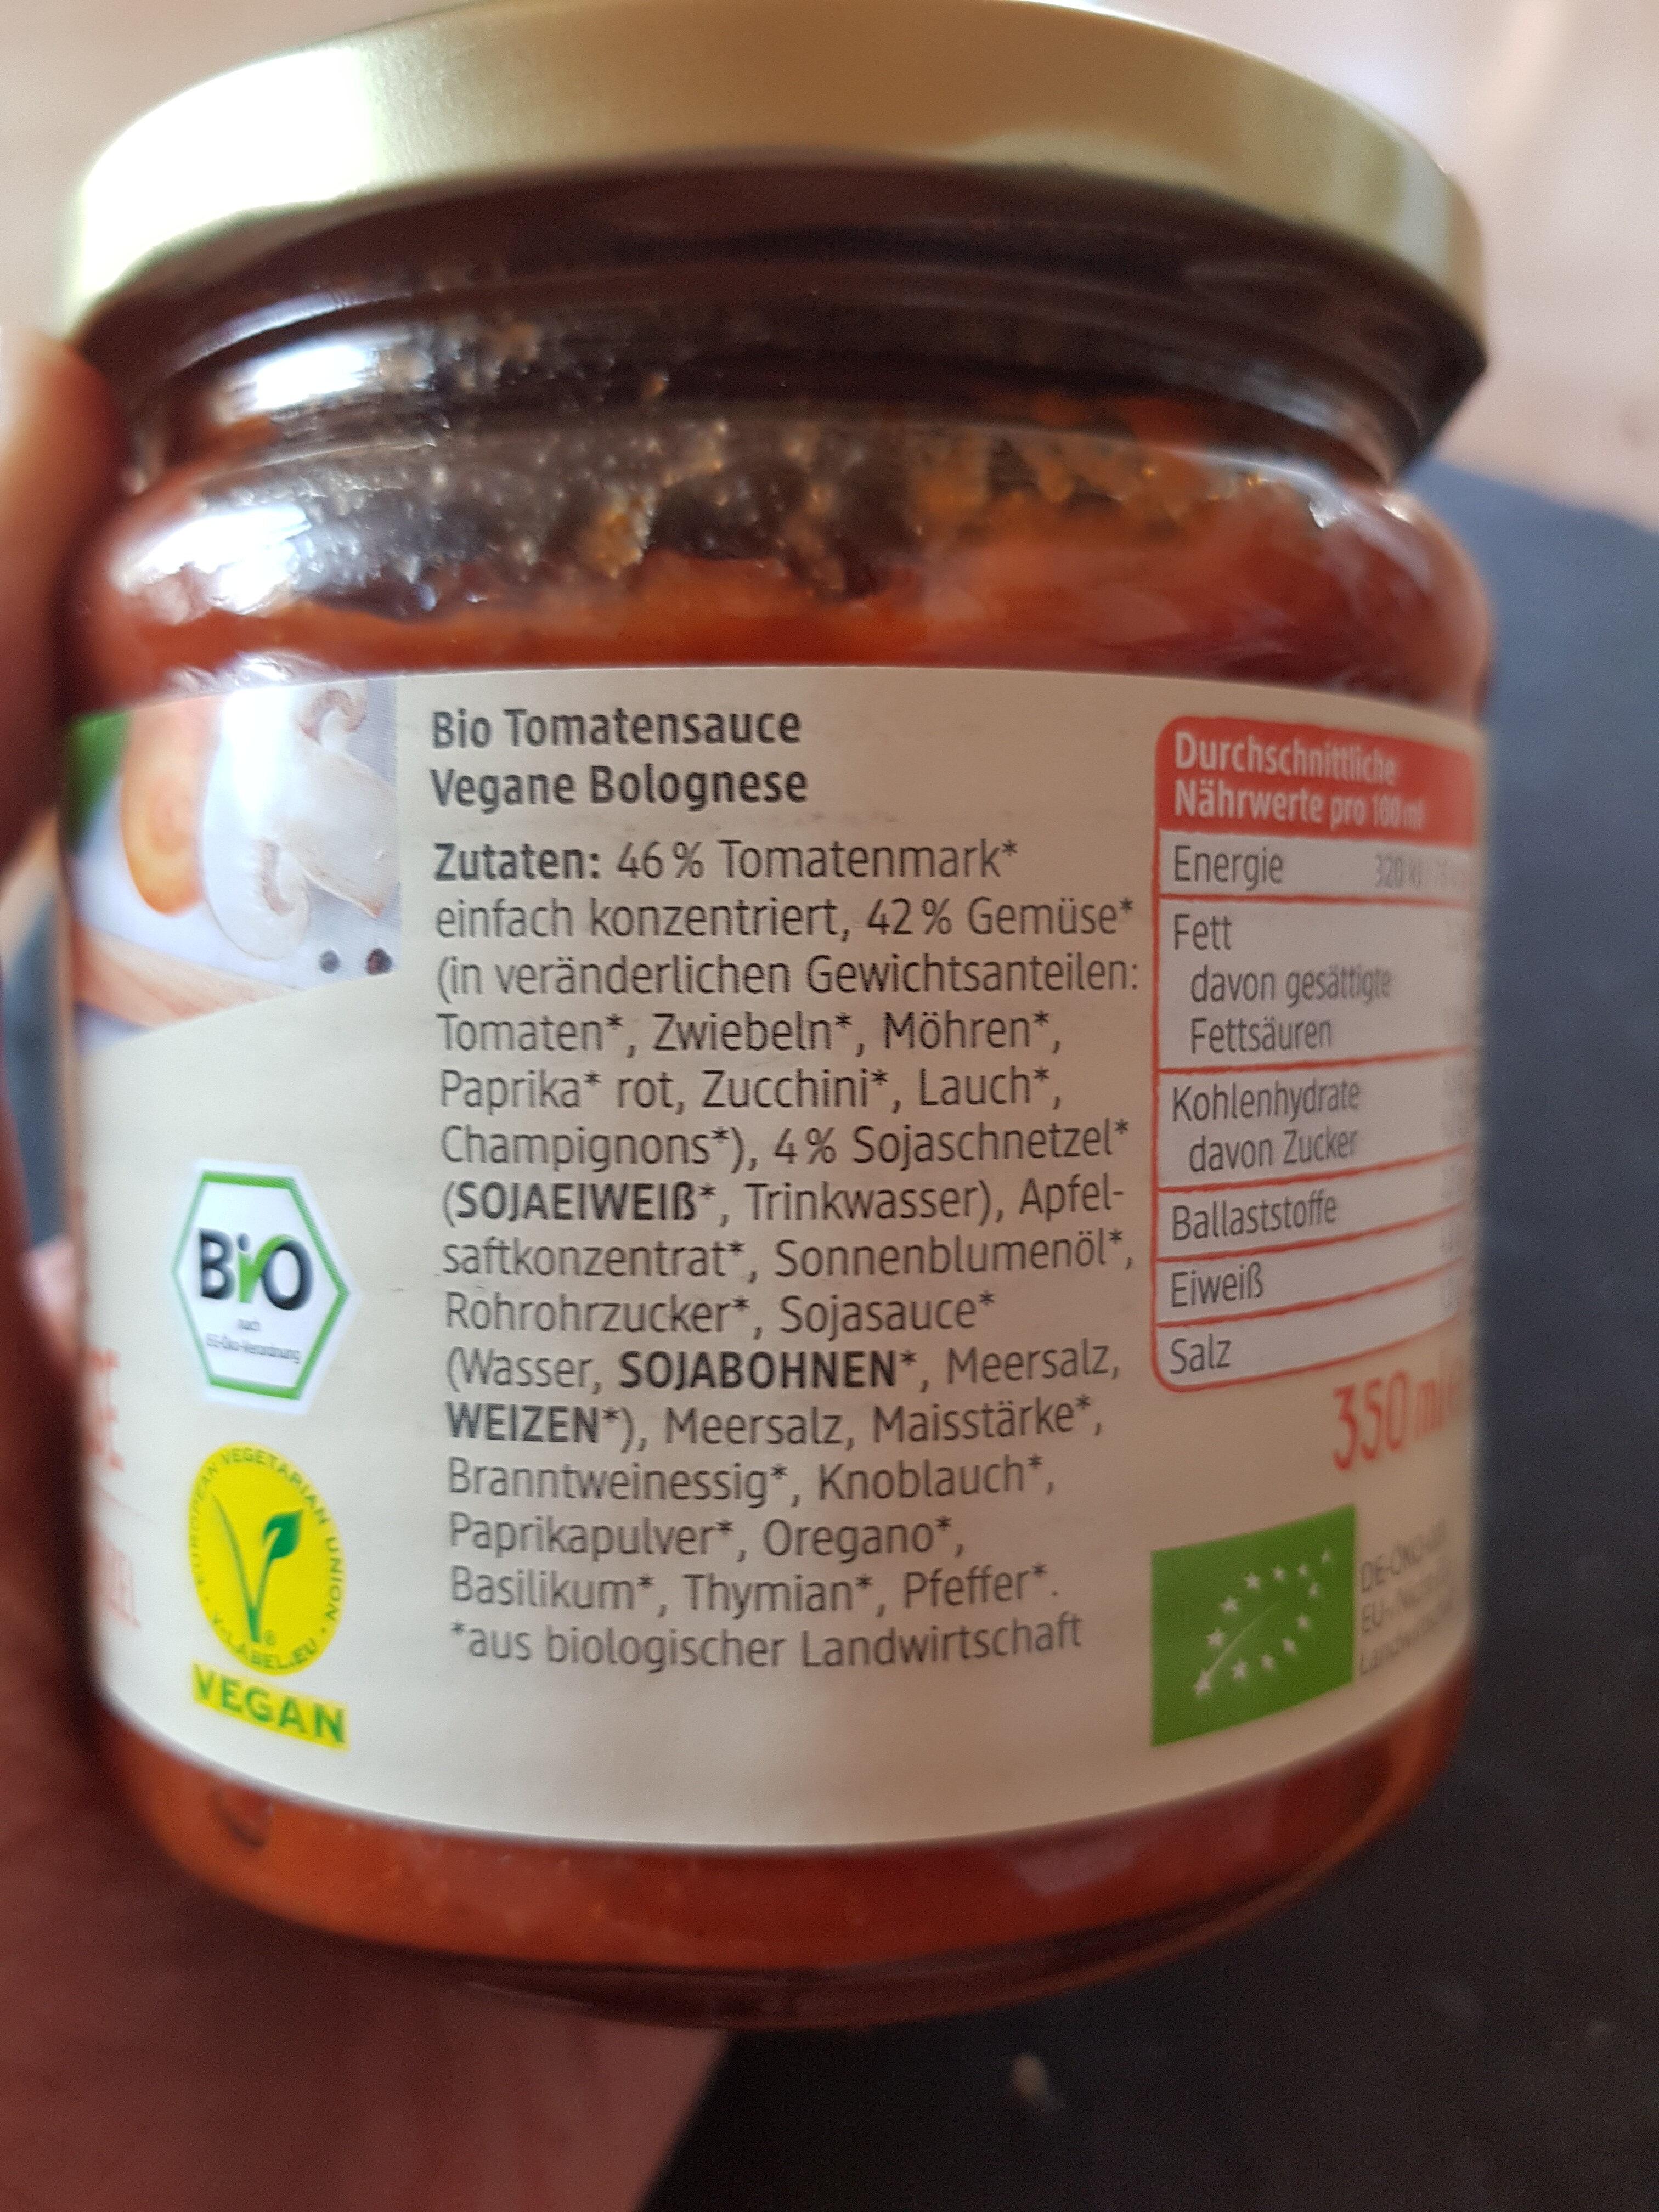 Vegane Bolognese mit Sojaschnetzel - Ingrediënten - de